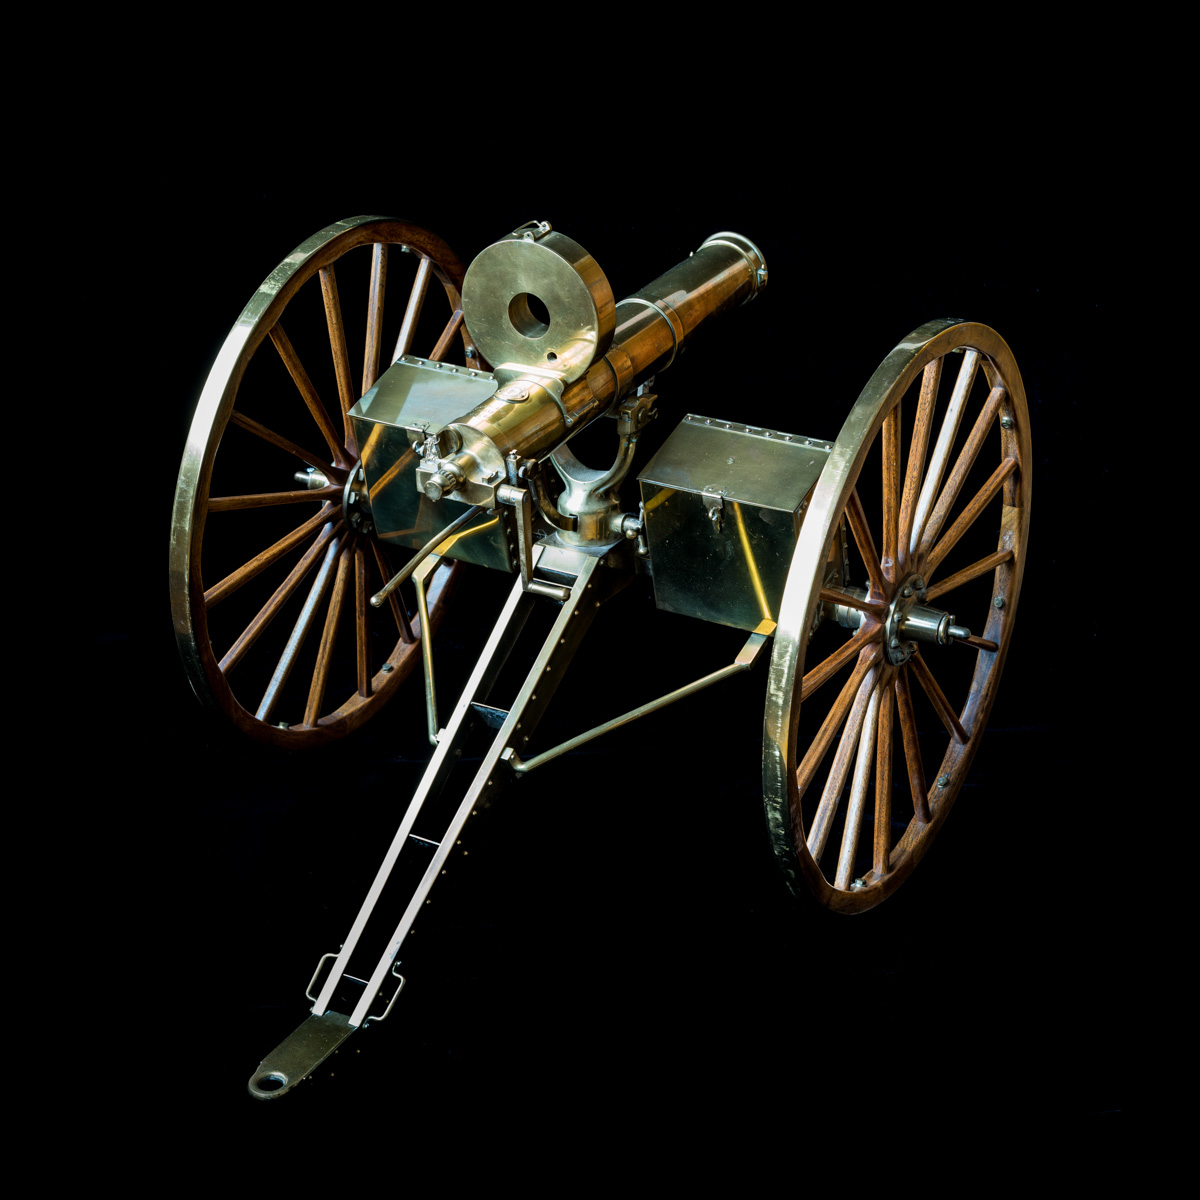 Gatling Gun 1-3rd size model-10